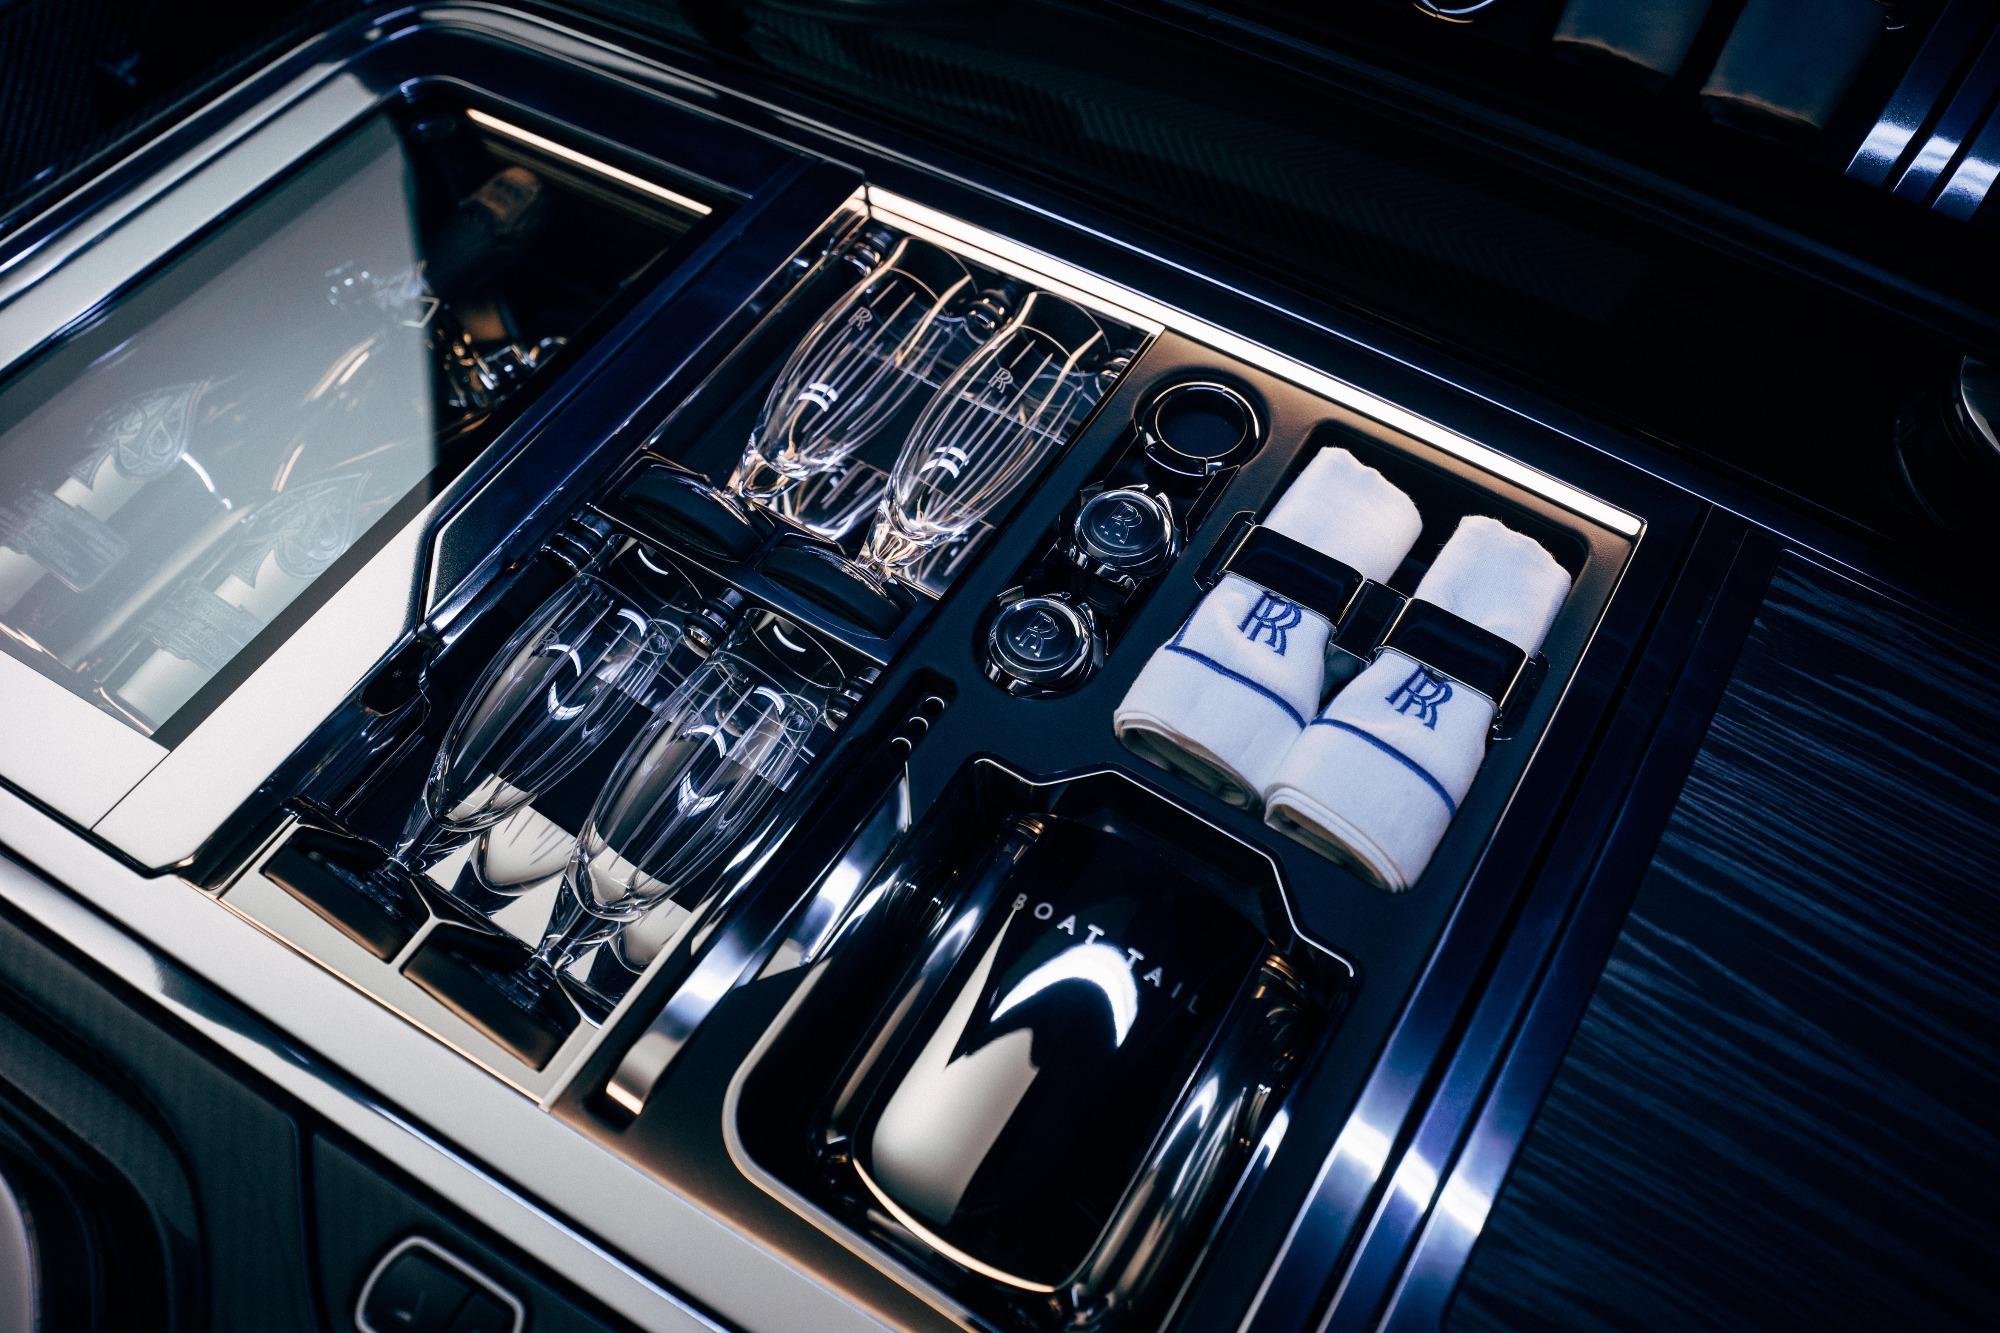 Suíte de Hospedagem do Rolls-Royce Boat Tail conversível